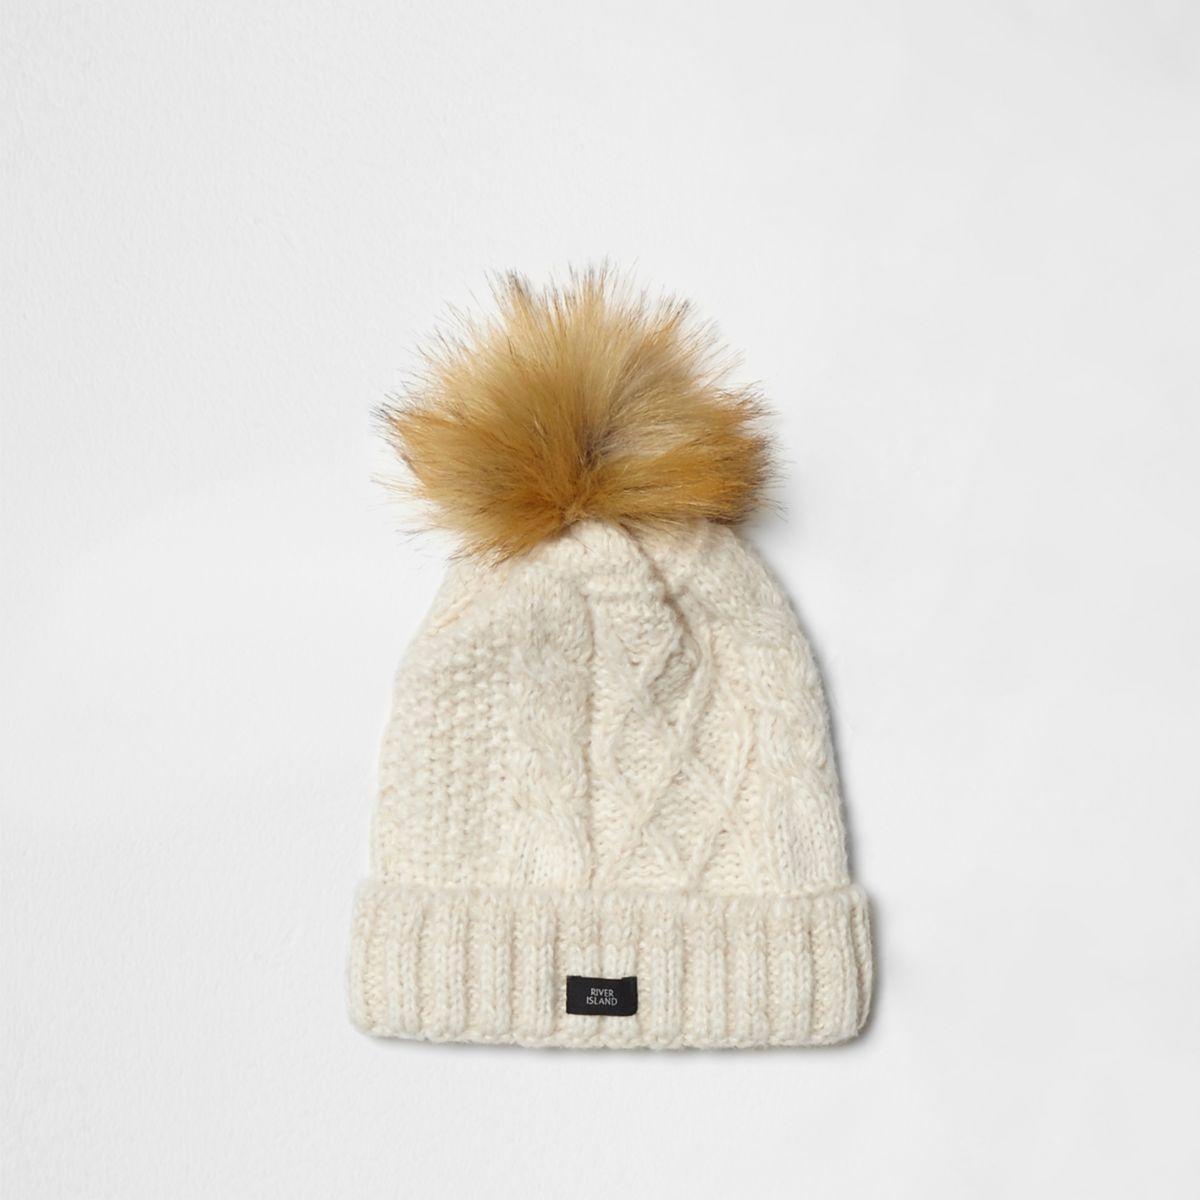 Boys cream cable knit bobble beanie hat